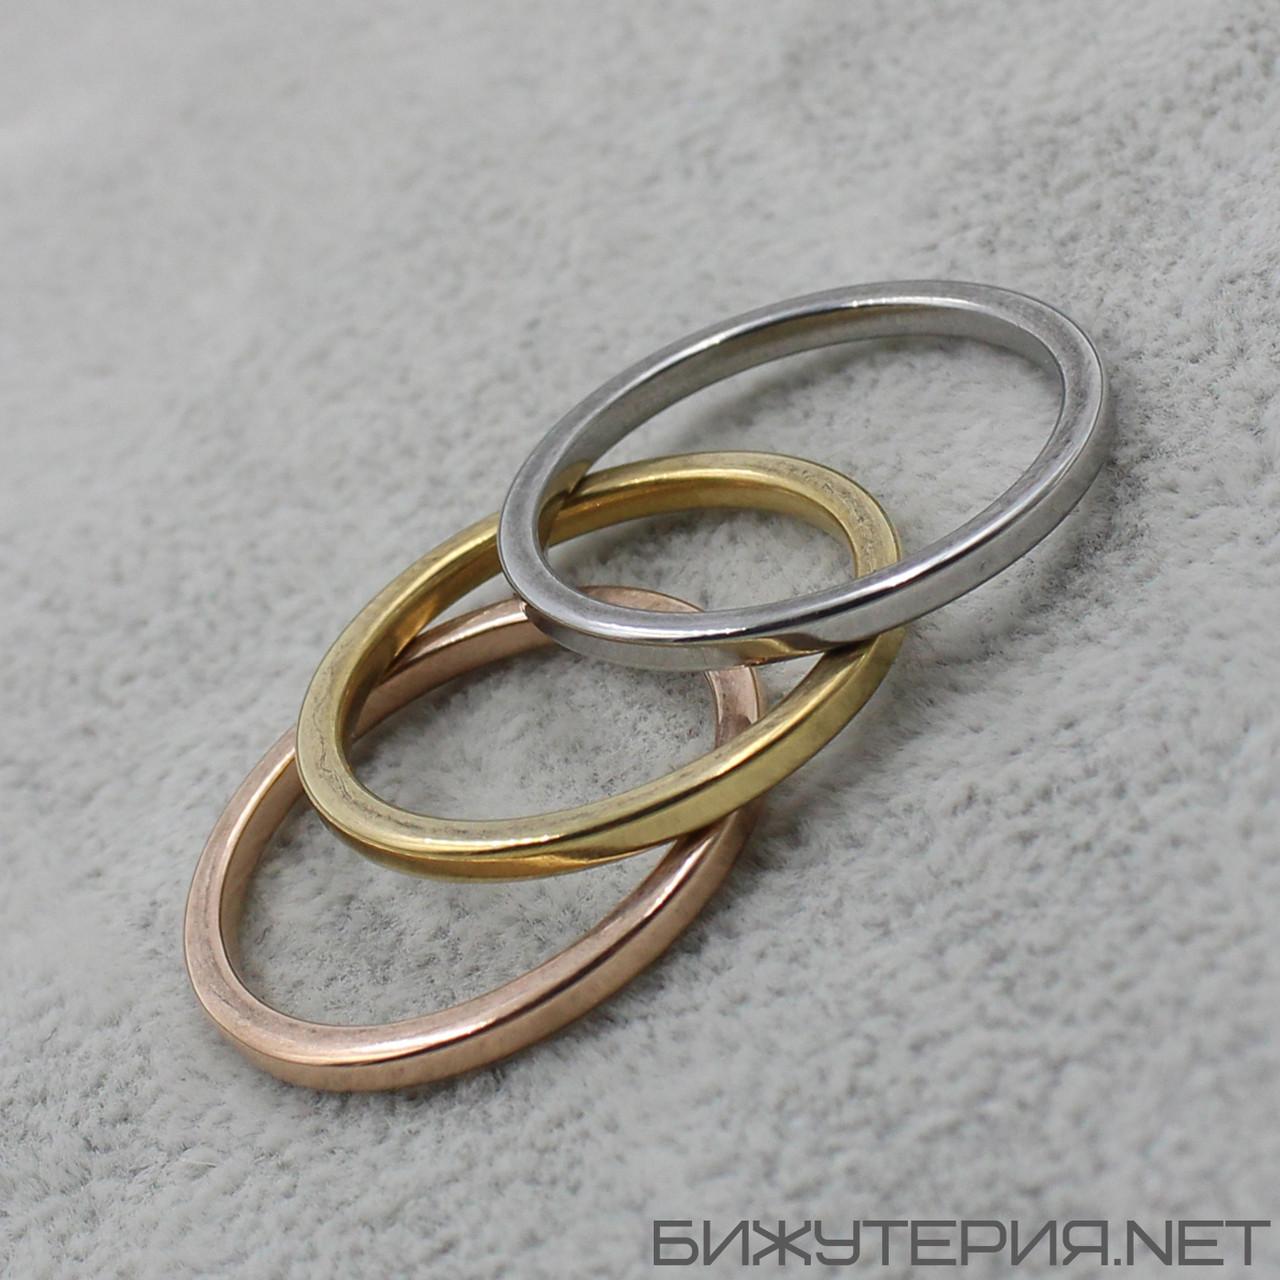 Мужское  кольцо 3 в 1 Stainless Steel